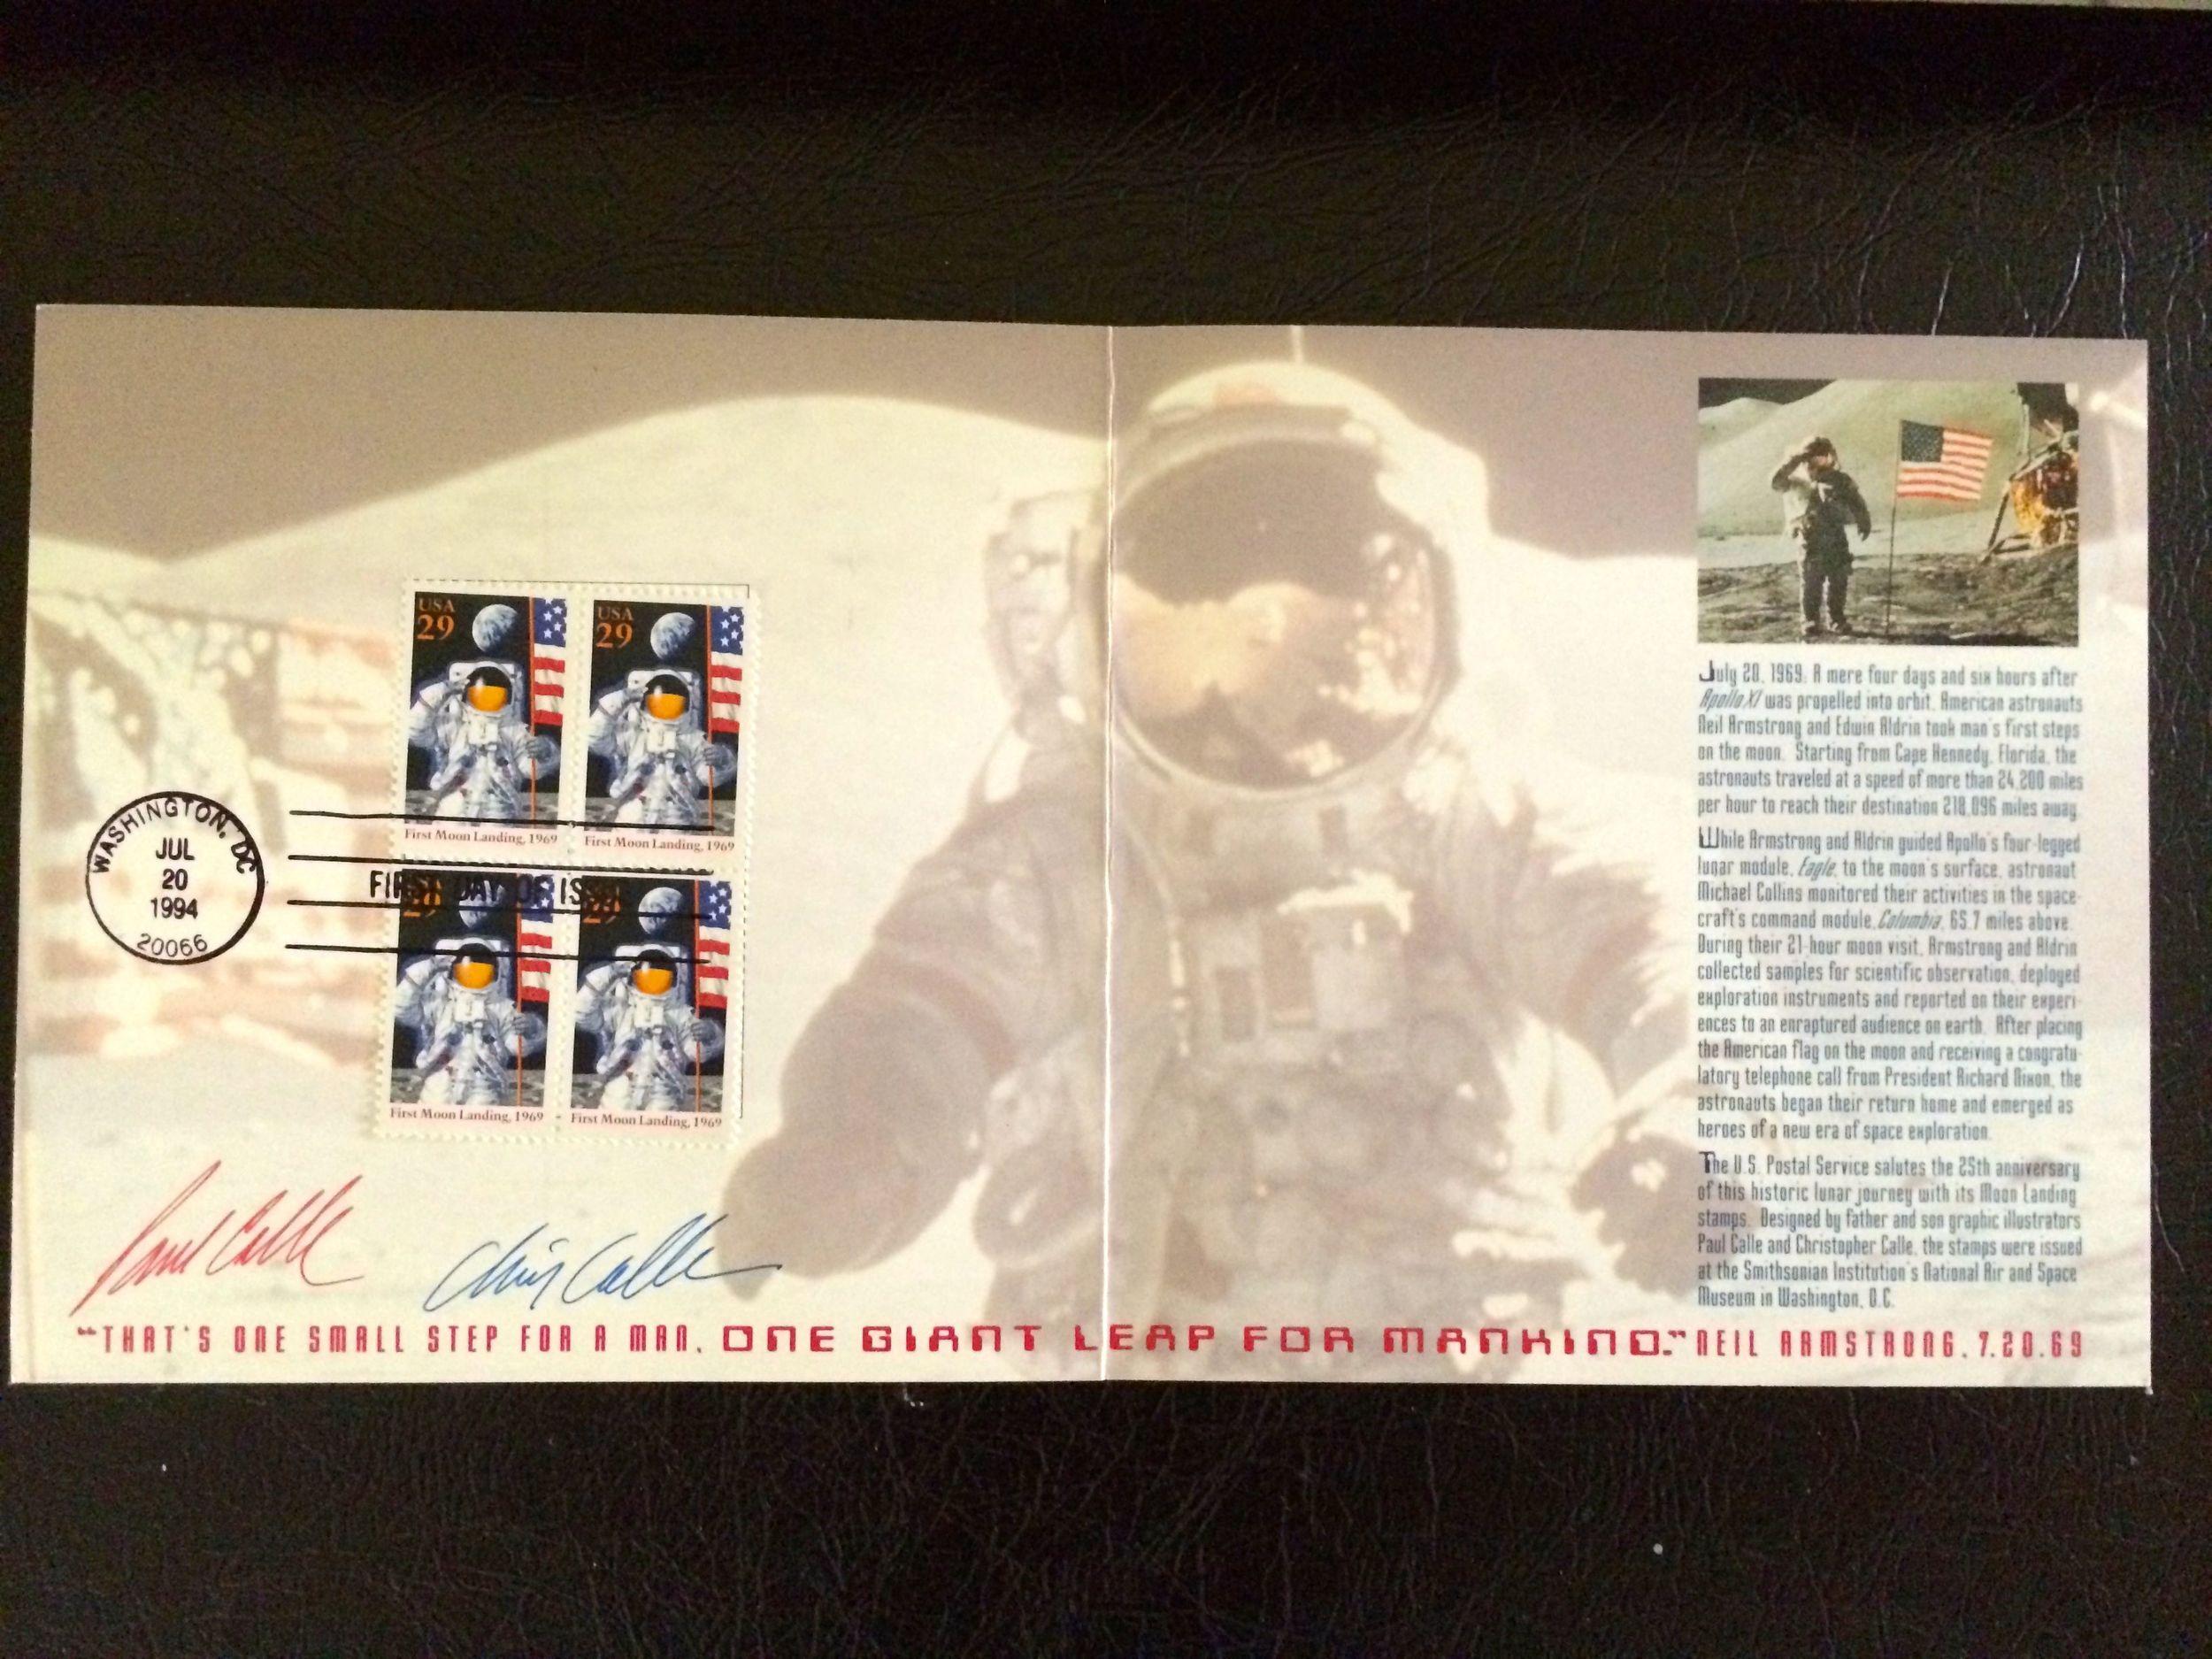 2014-07-20 - stamp book.jpg